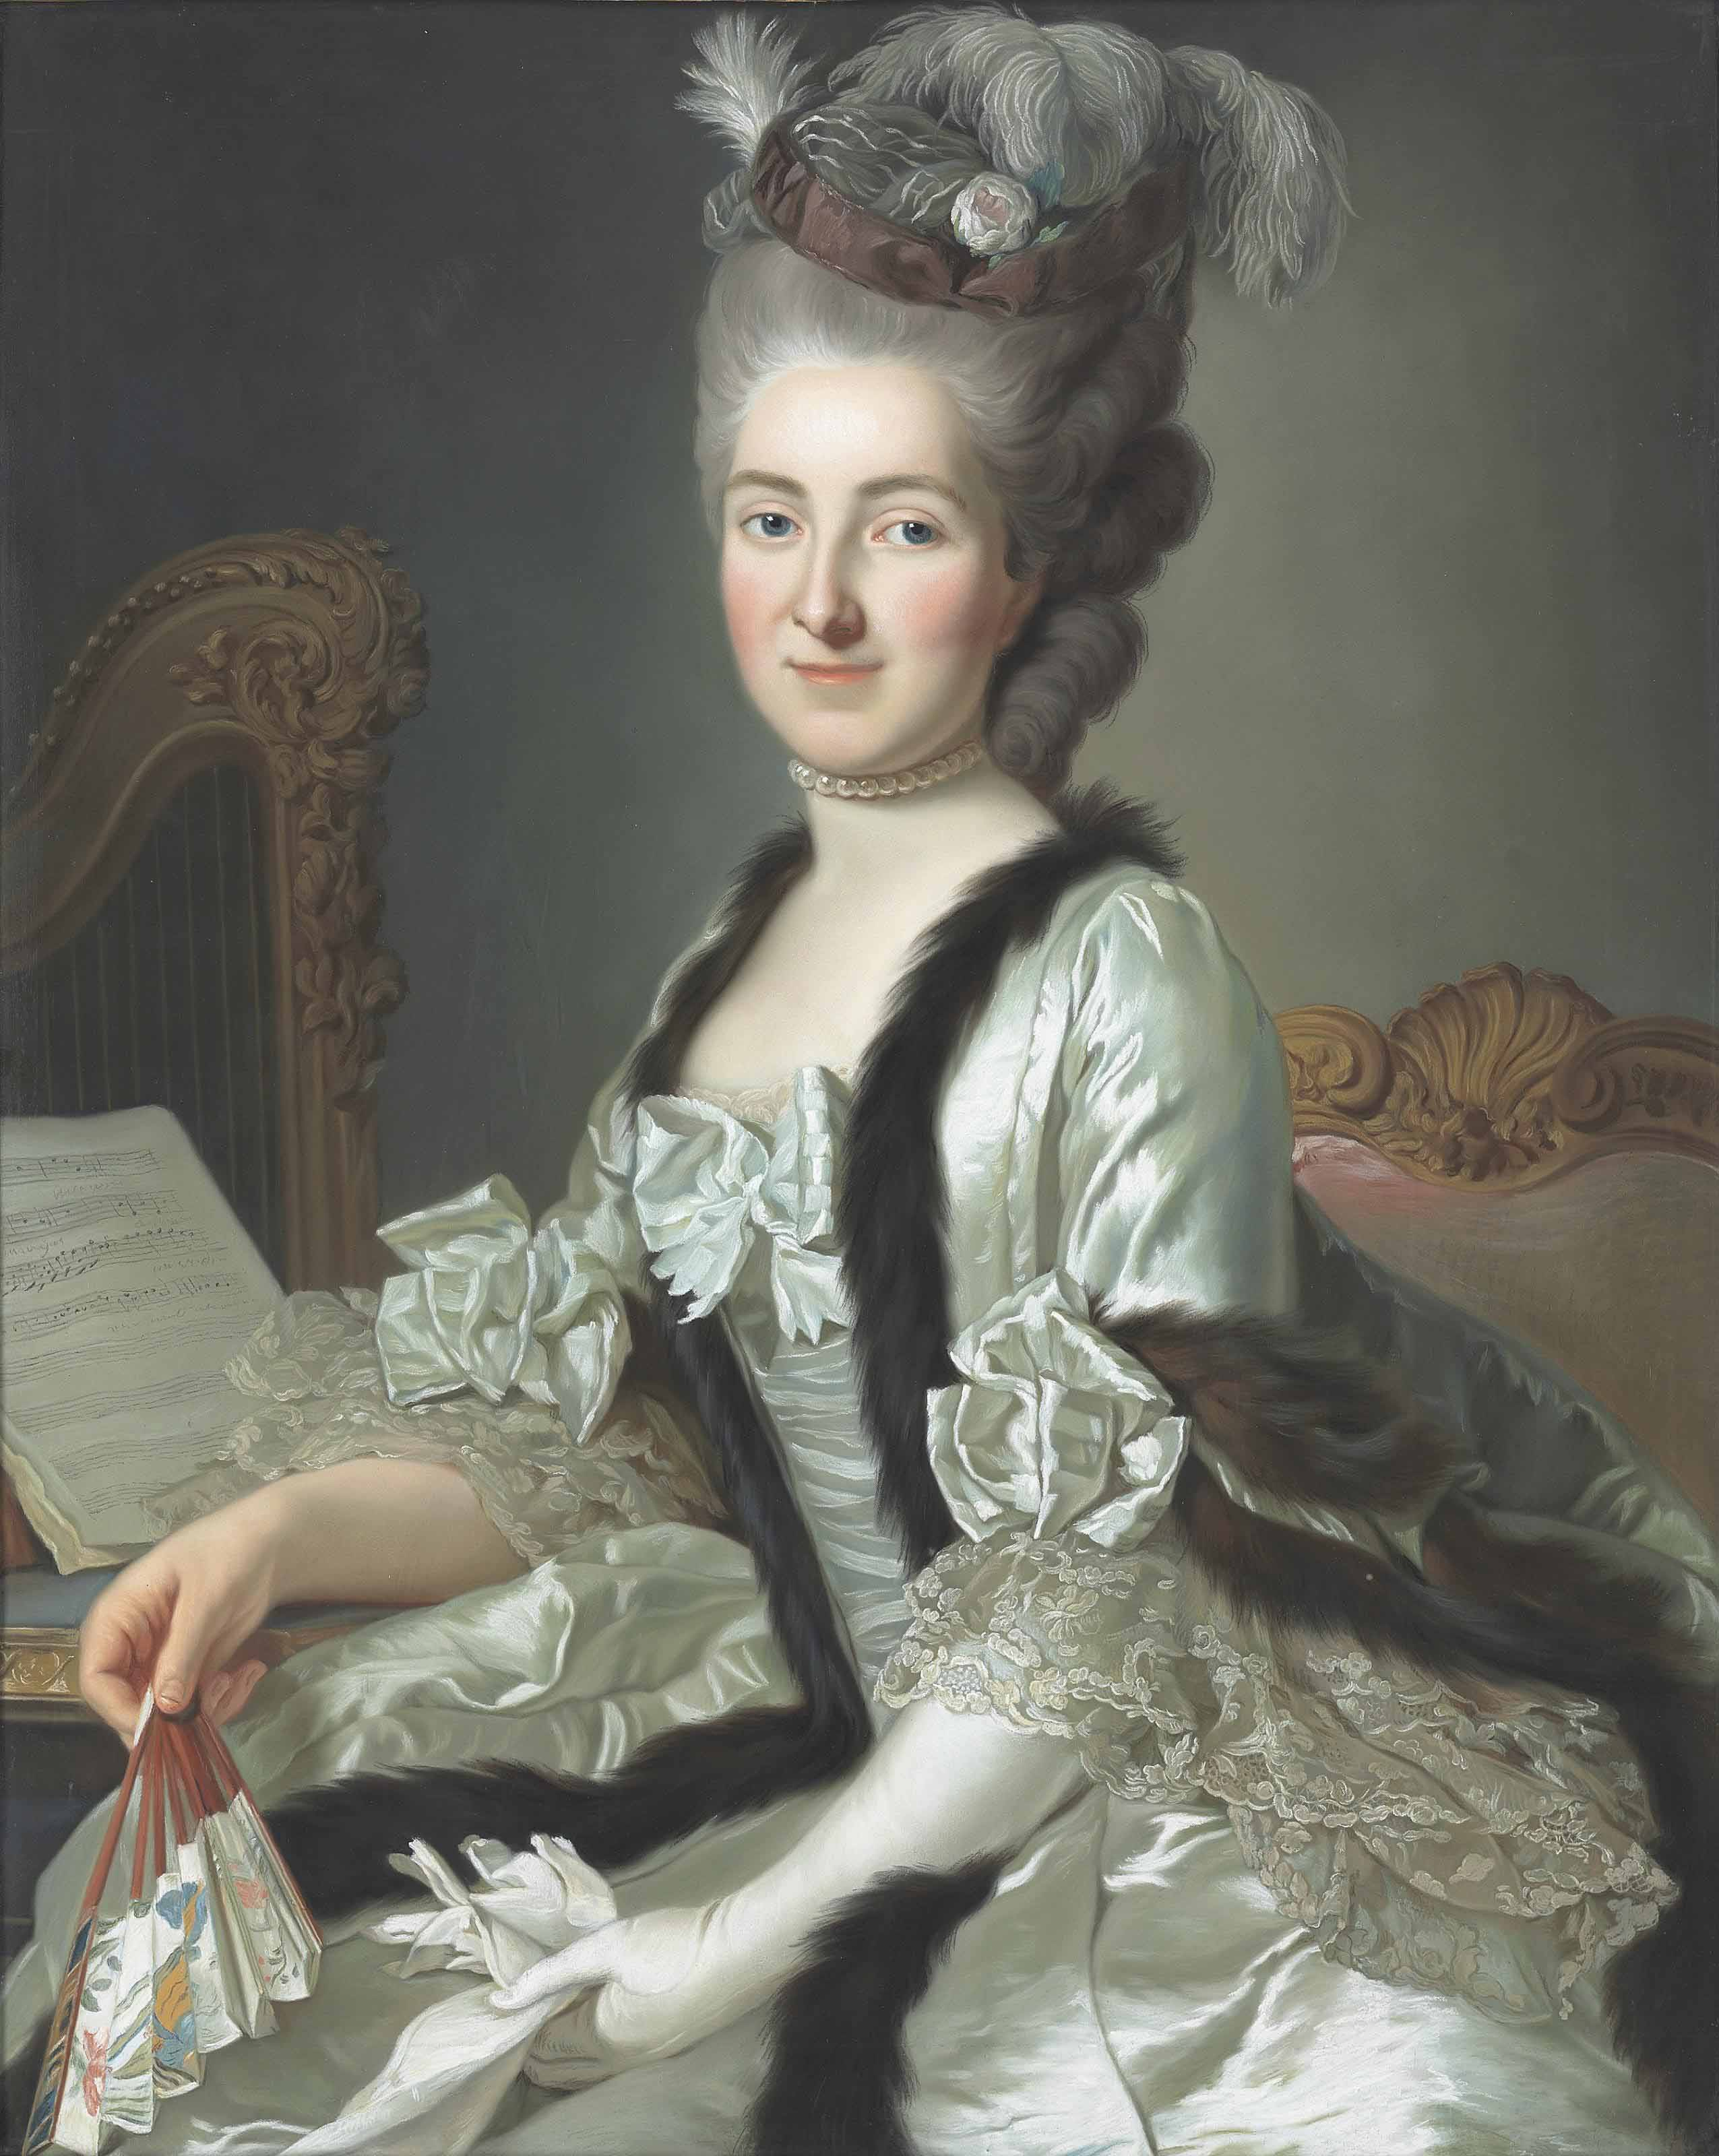 Portrait of the Reichsgräfin von Fries, née Gräfin Anna d'Escherny (1737-1807), seated, half length, in a plumed headdress and white satin fur-trimmed gown